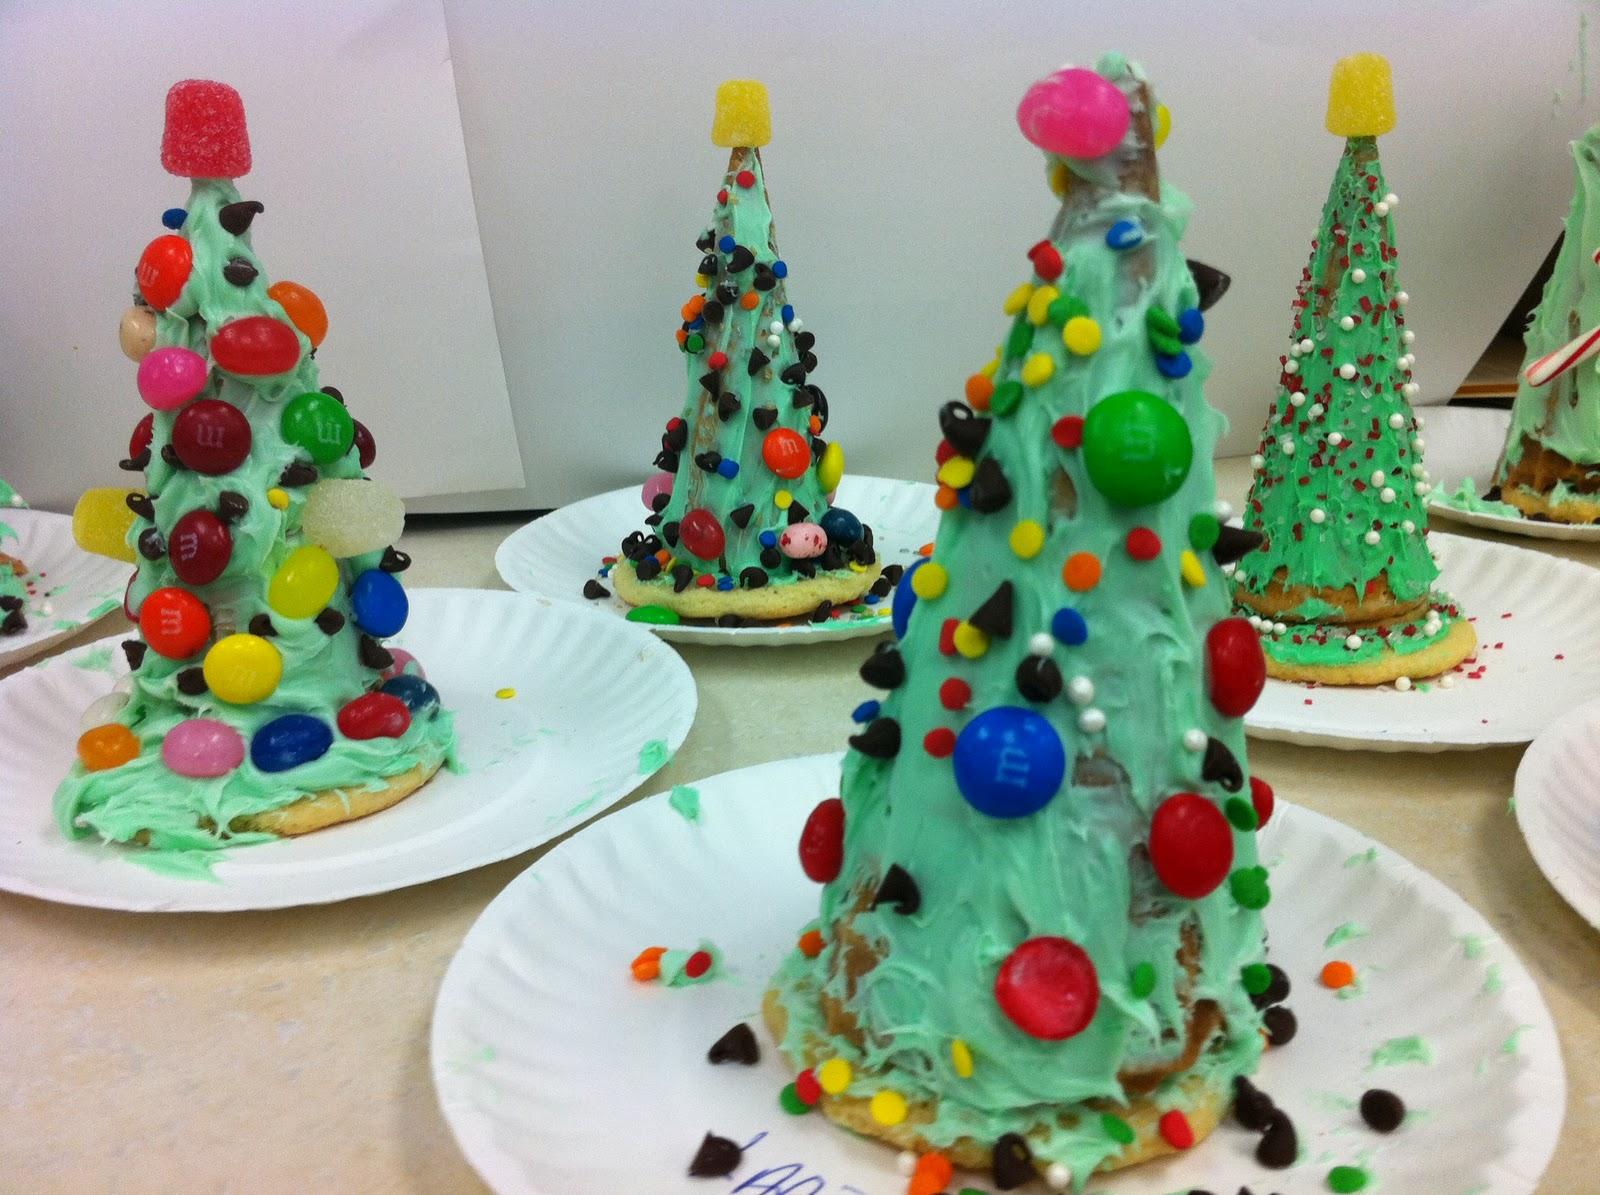 My Life According To Pinterest: Edible Christmas Trees